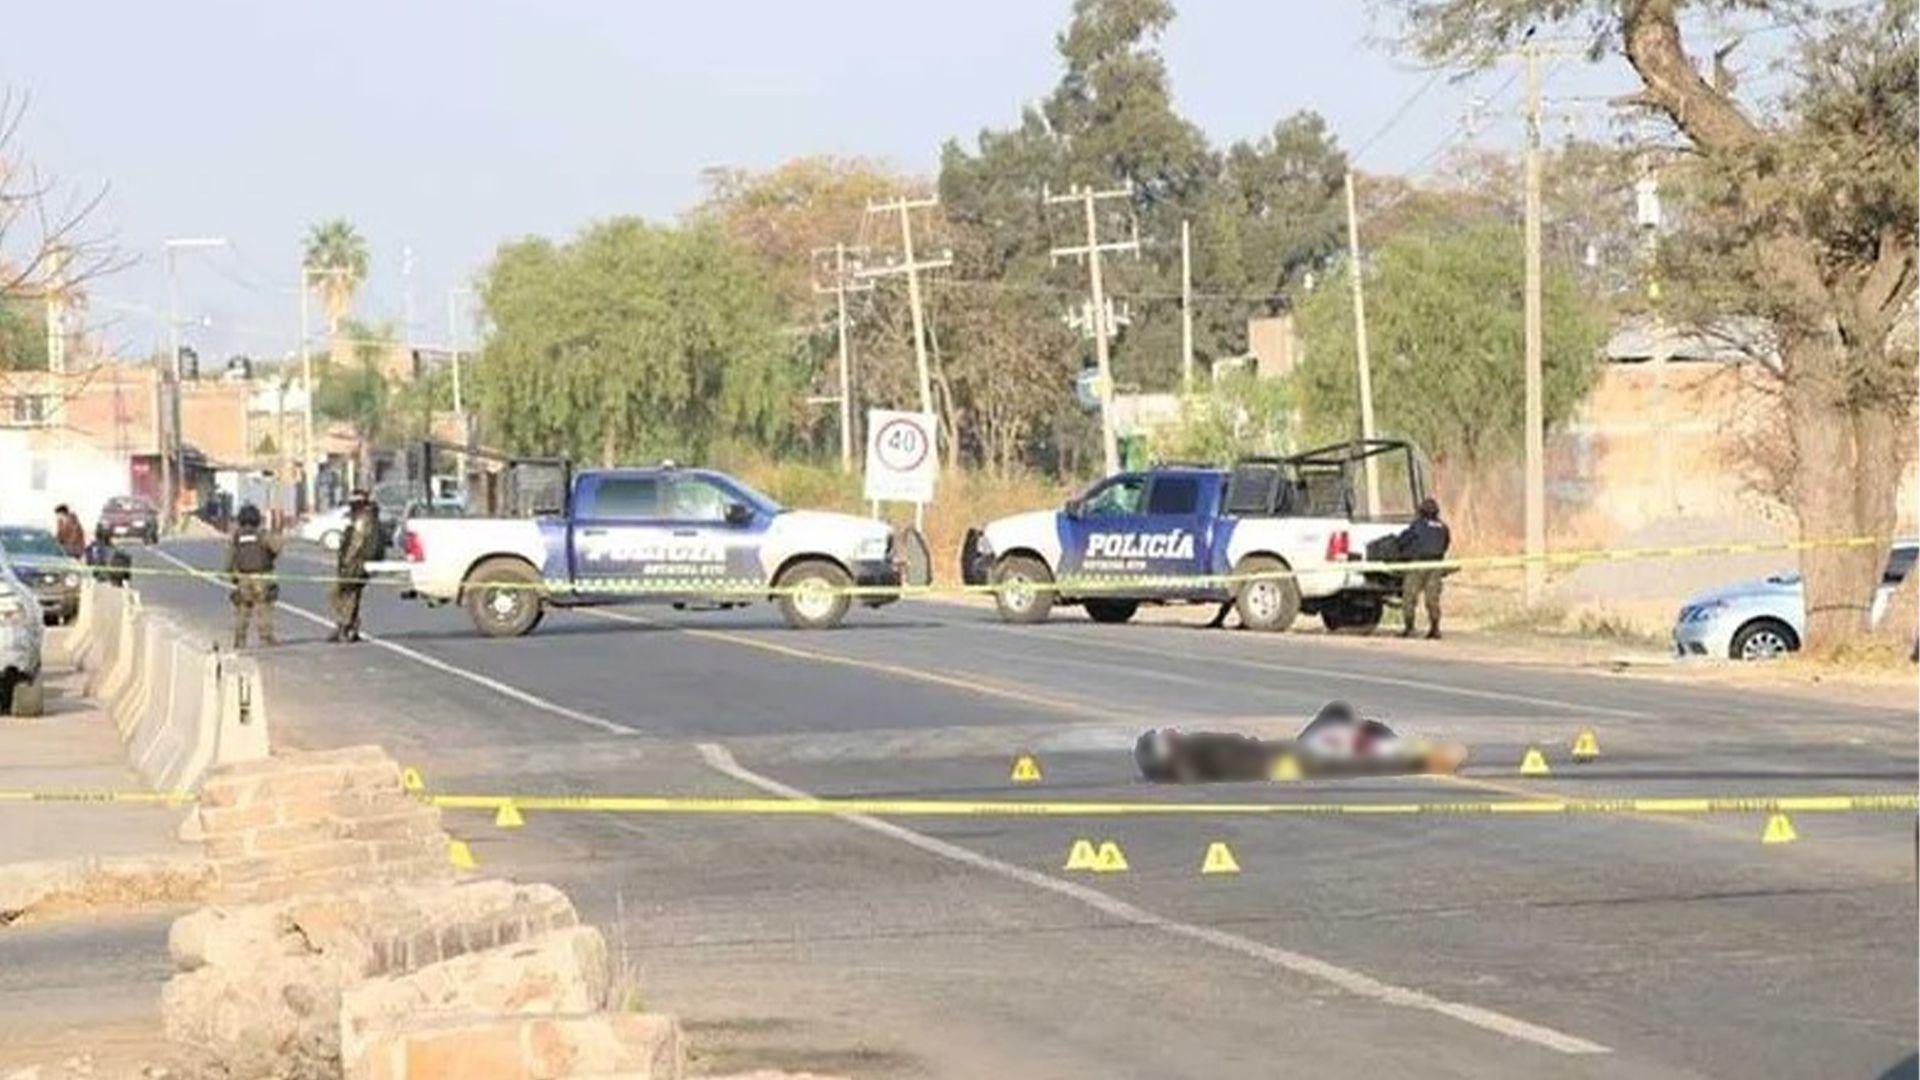 5 muertos del cartel Santa Rosa de Lima en Guanajuato (Foto: Twitter@Diariodenarco)